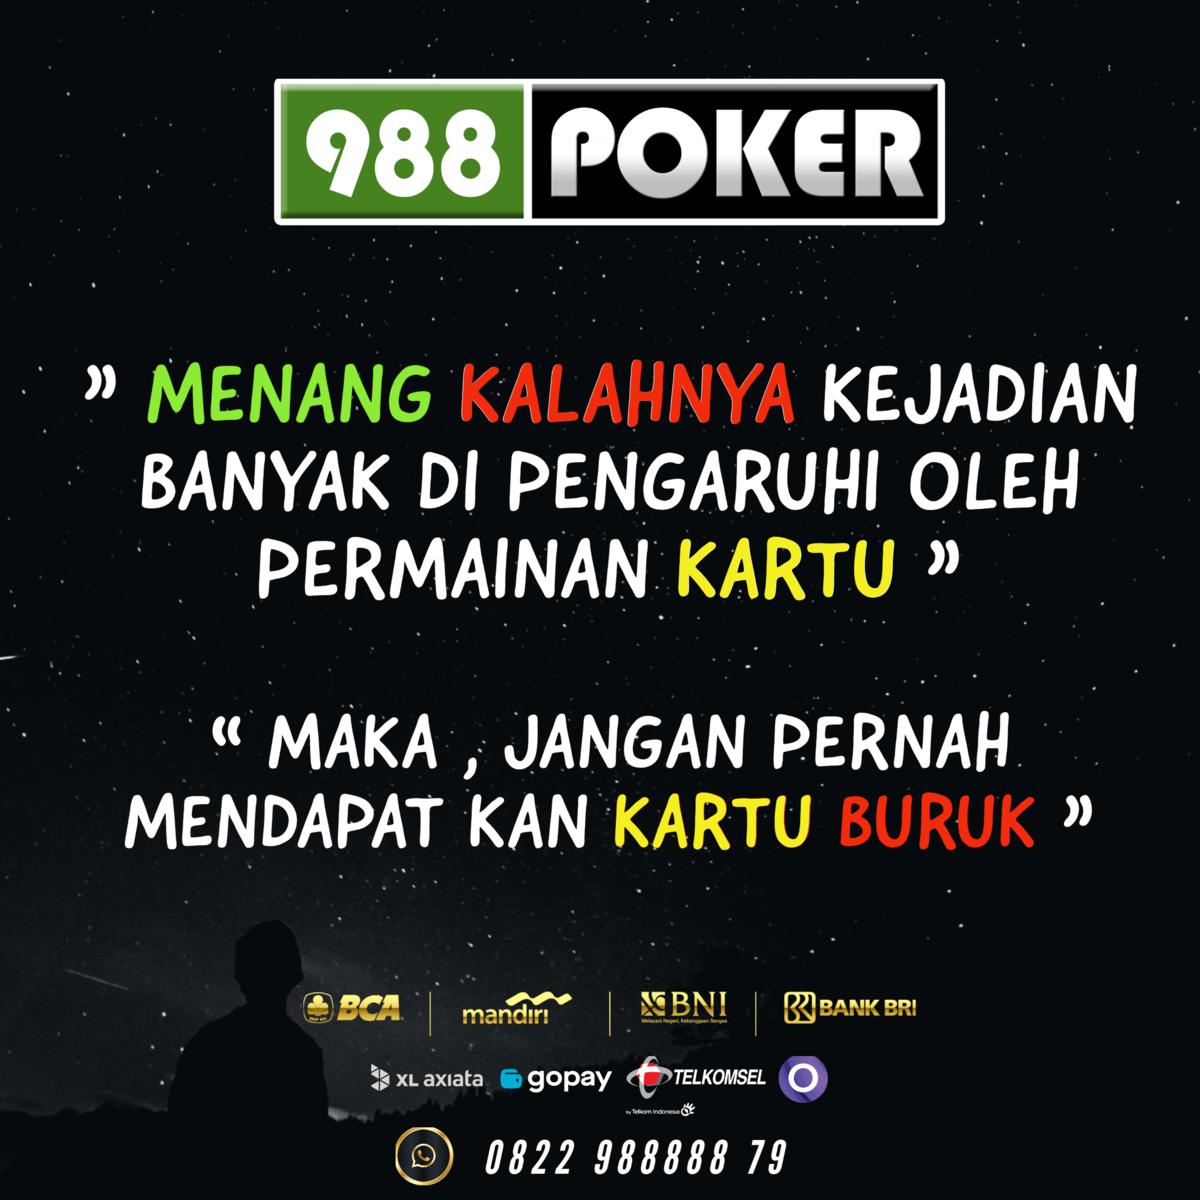 Program Agen Idn Poker Dominoqq Online Painwave S Diary